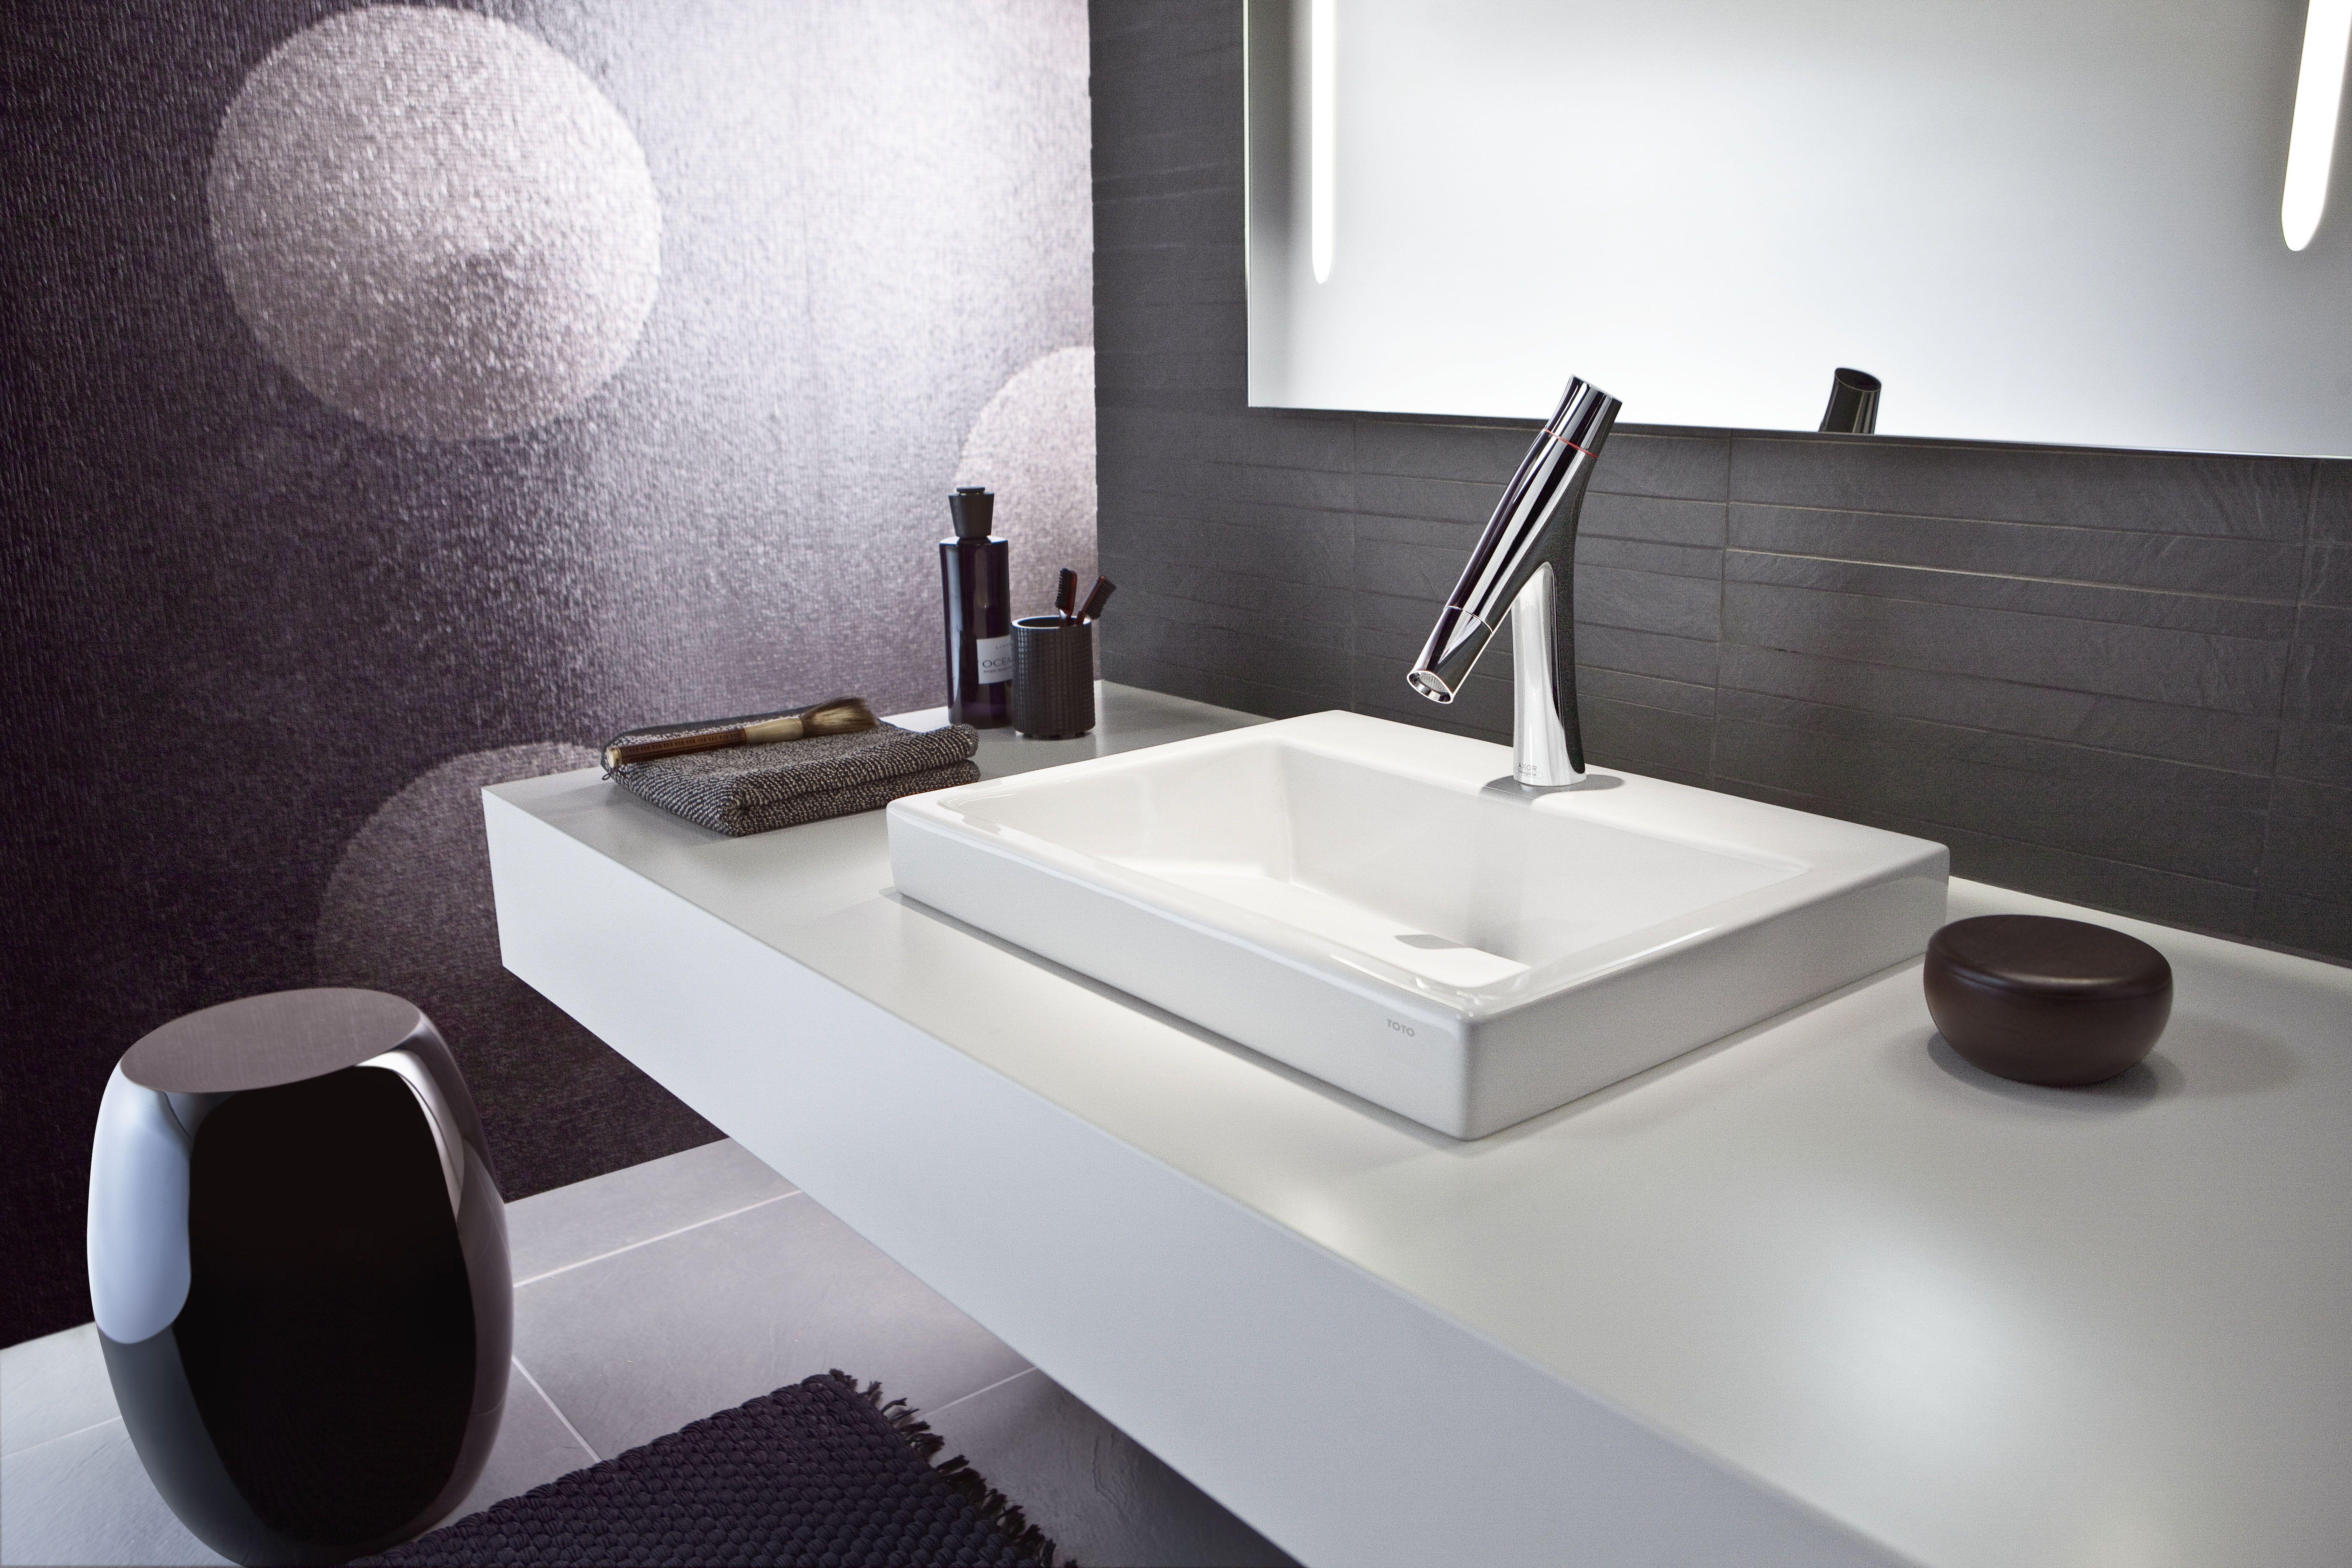 Axor Strack Organic 2Handle Singlehole Faucet Hansgrohe Captivating Bathroom Design Centre Decorating Inspiration